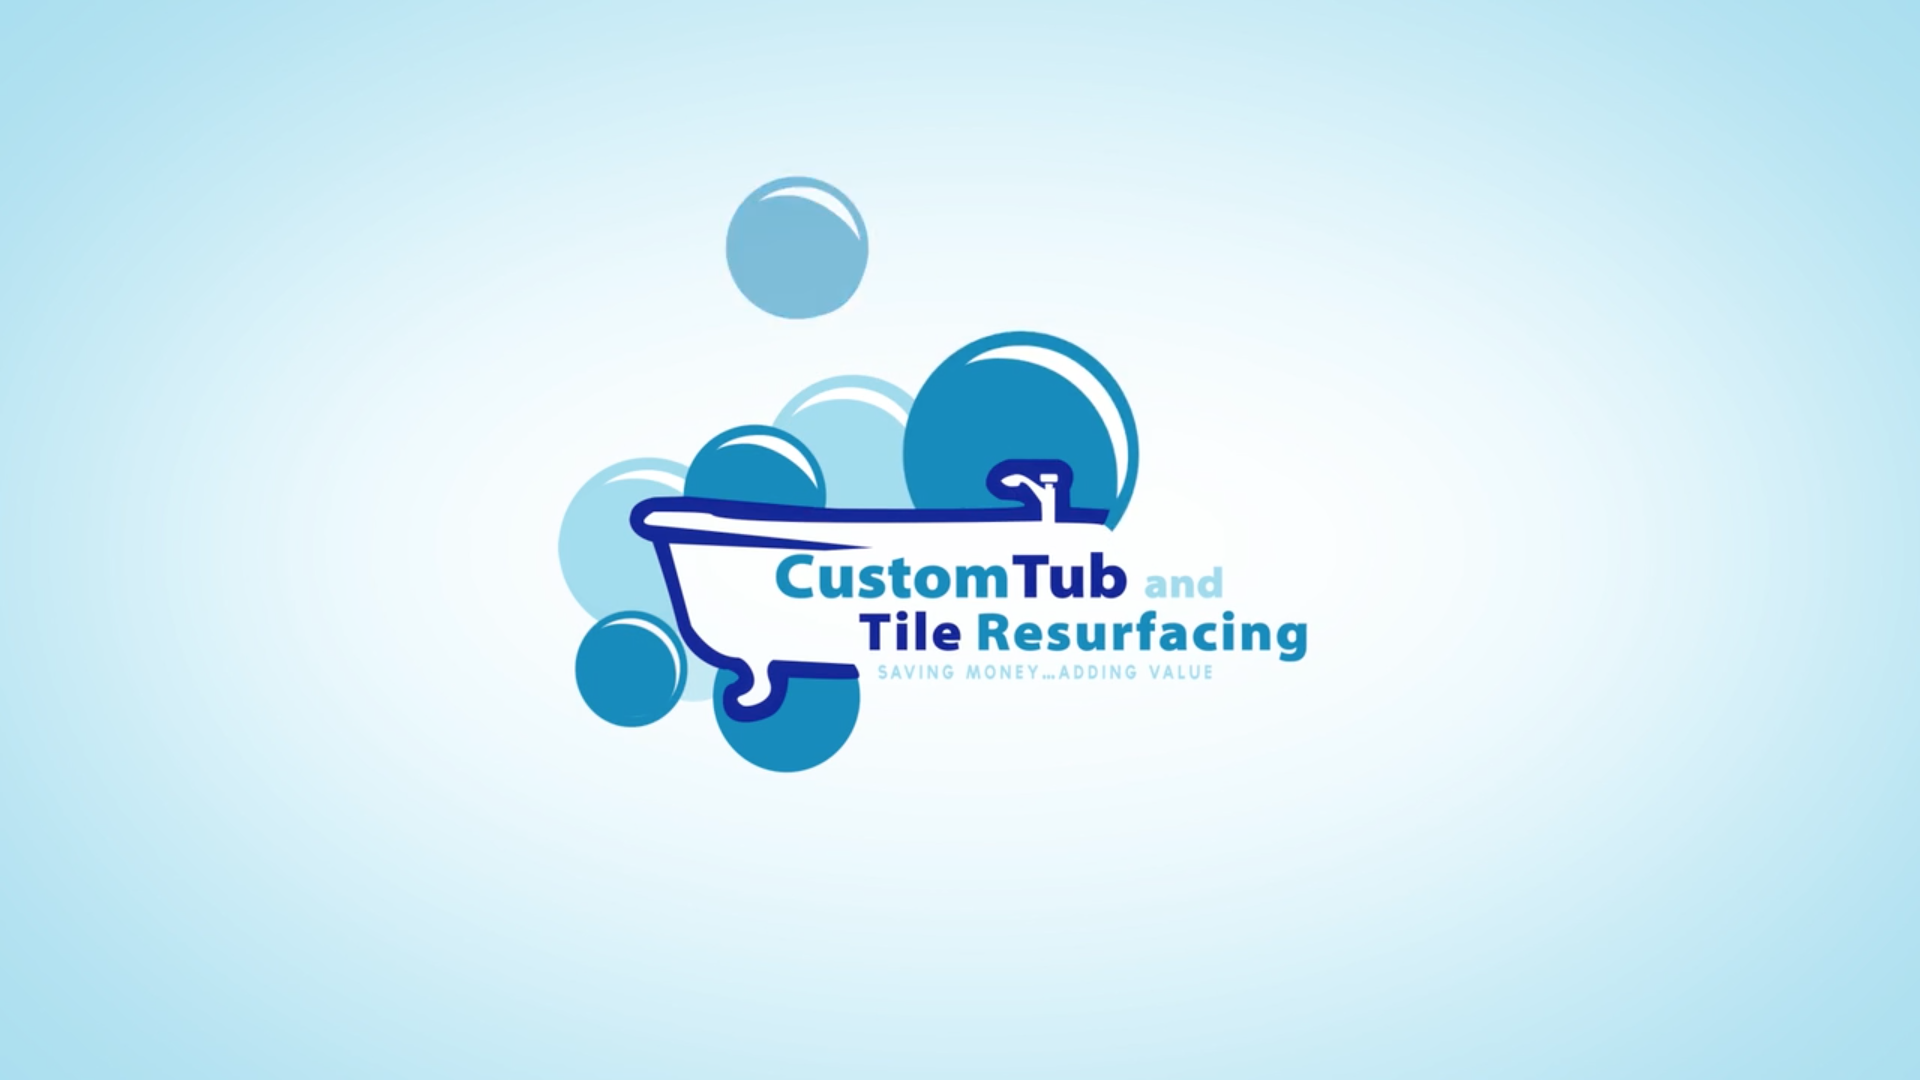 CUSTOM TUB AND TILE RESURFACING – The smart way to remodel.